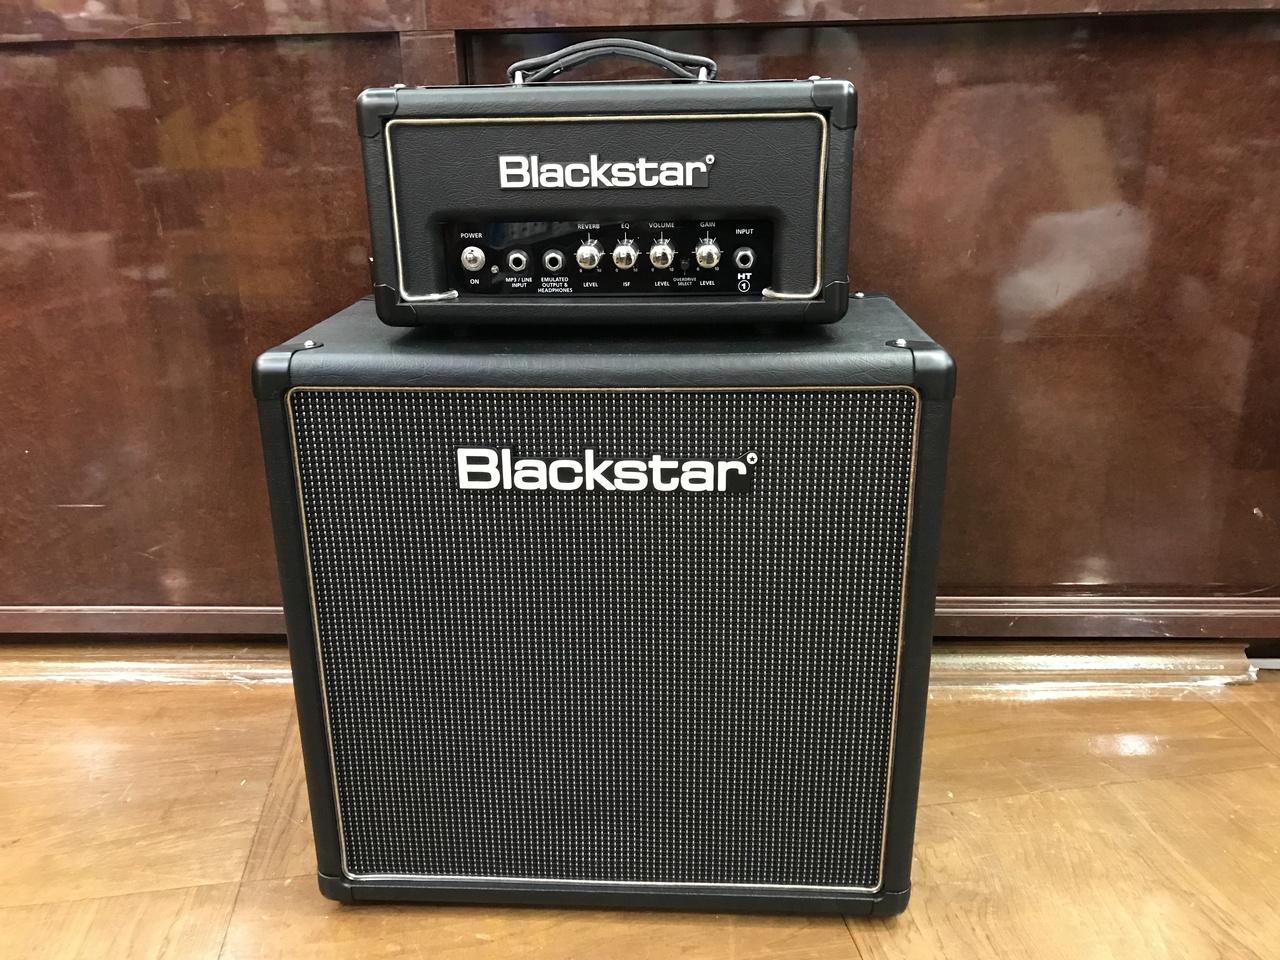 Blackstar HT-1RH + HT-112 【アウトレット特価】【生産完了モデル】